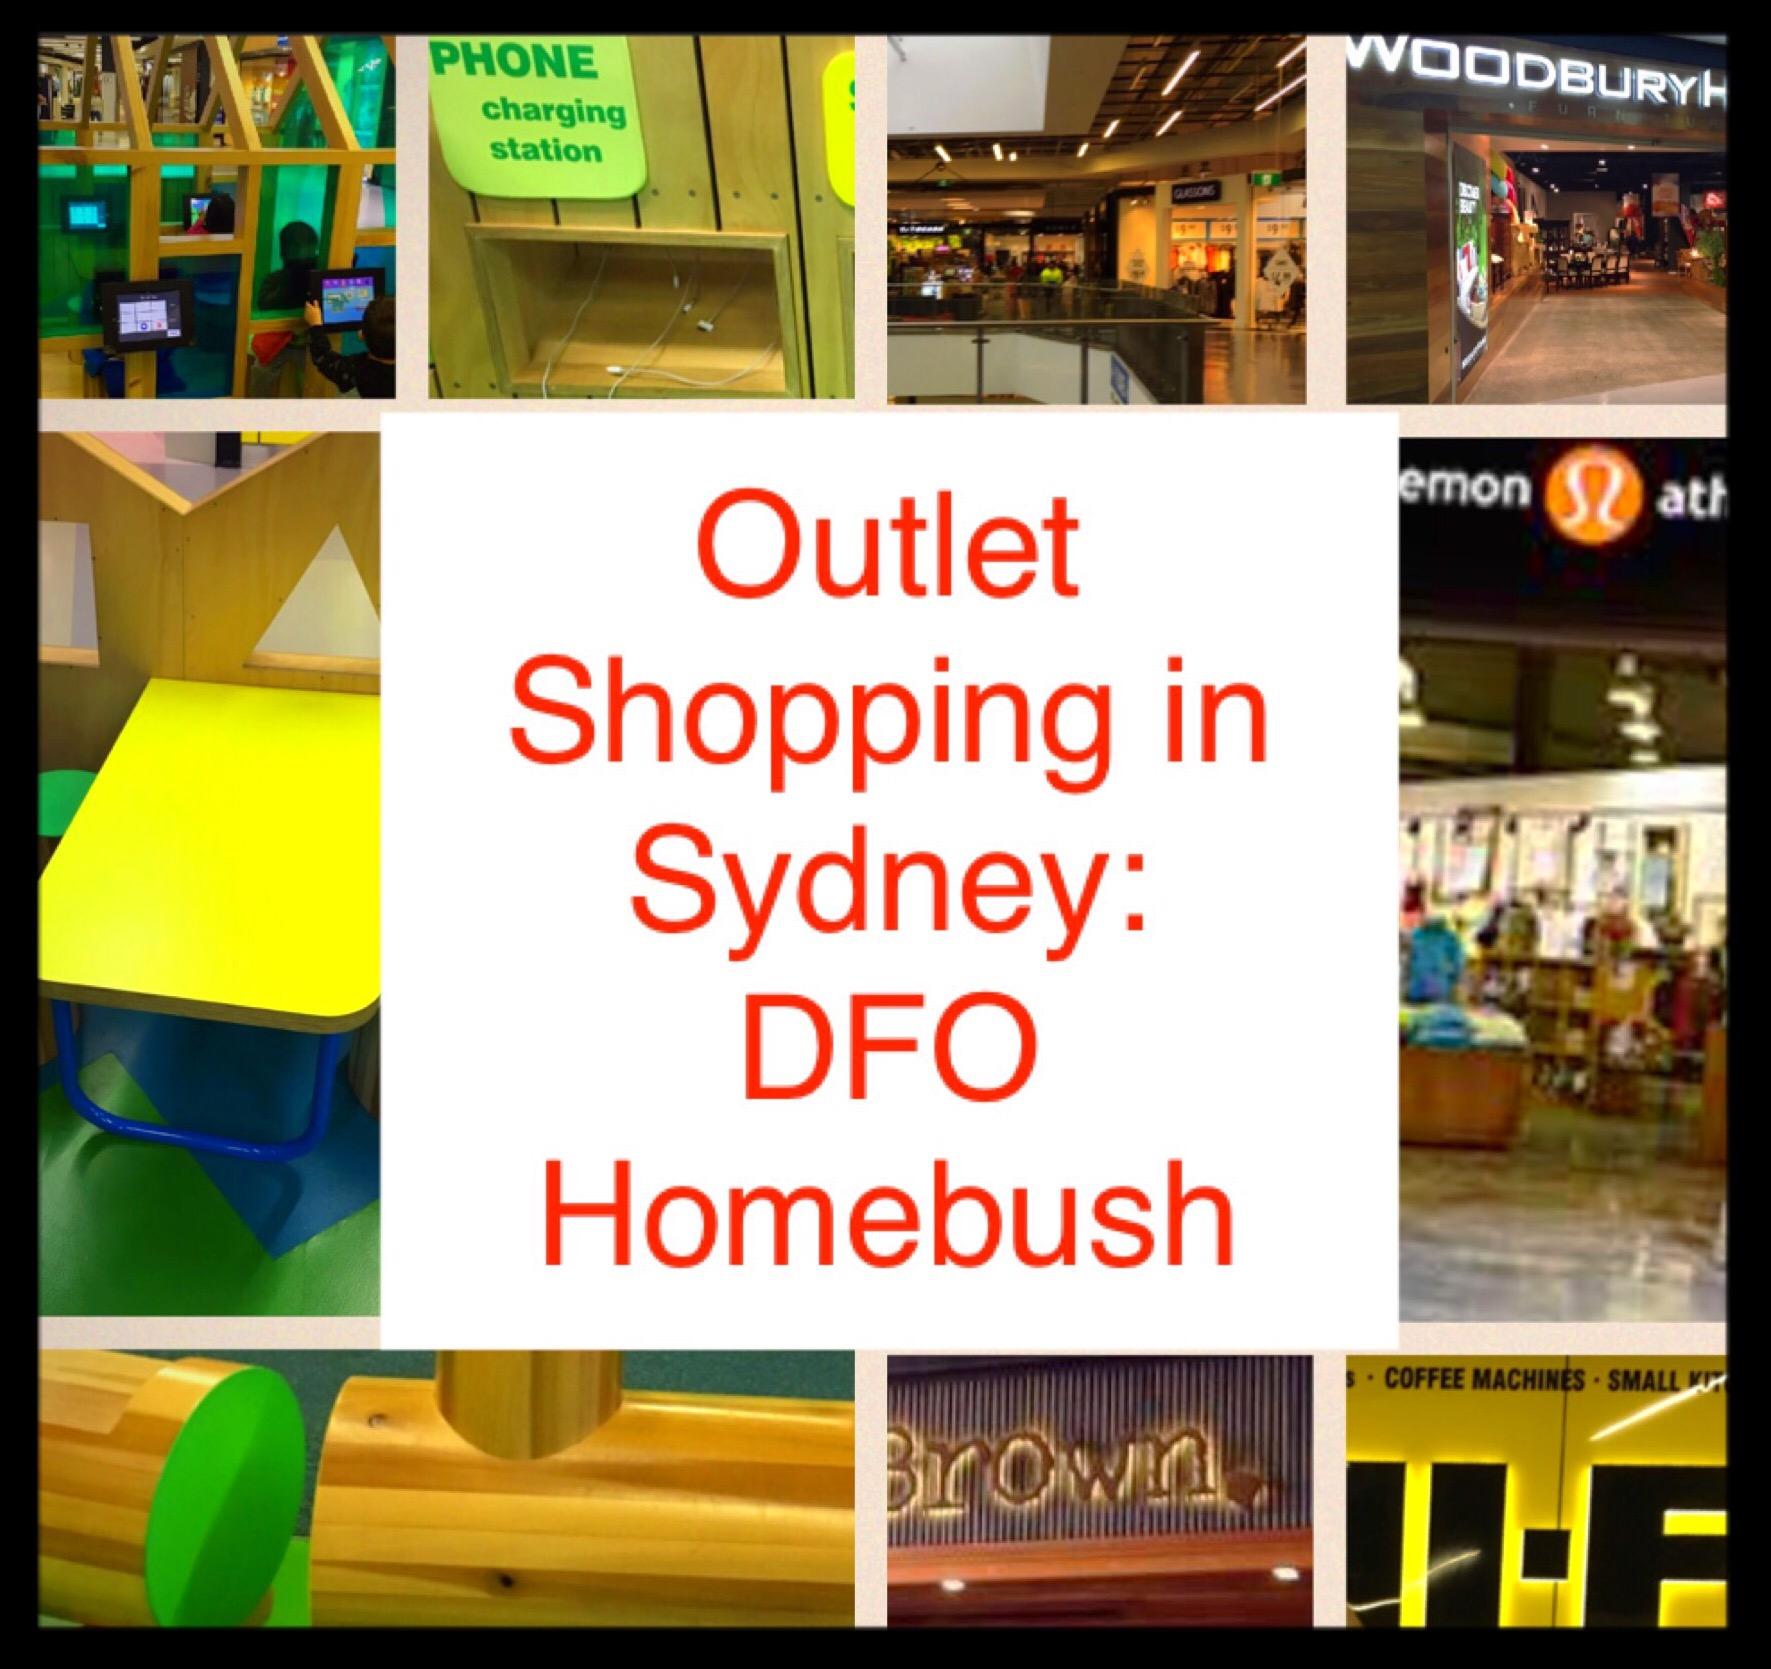 DFO Homebush Outlet Shopping